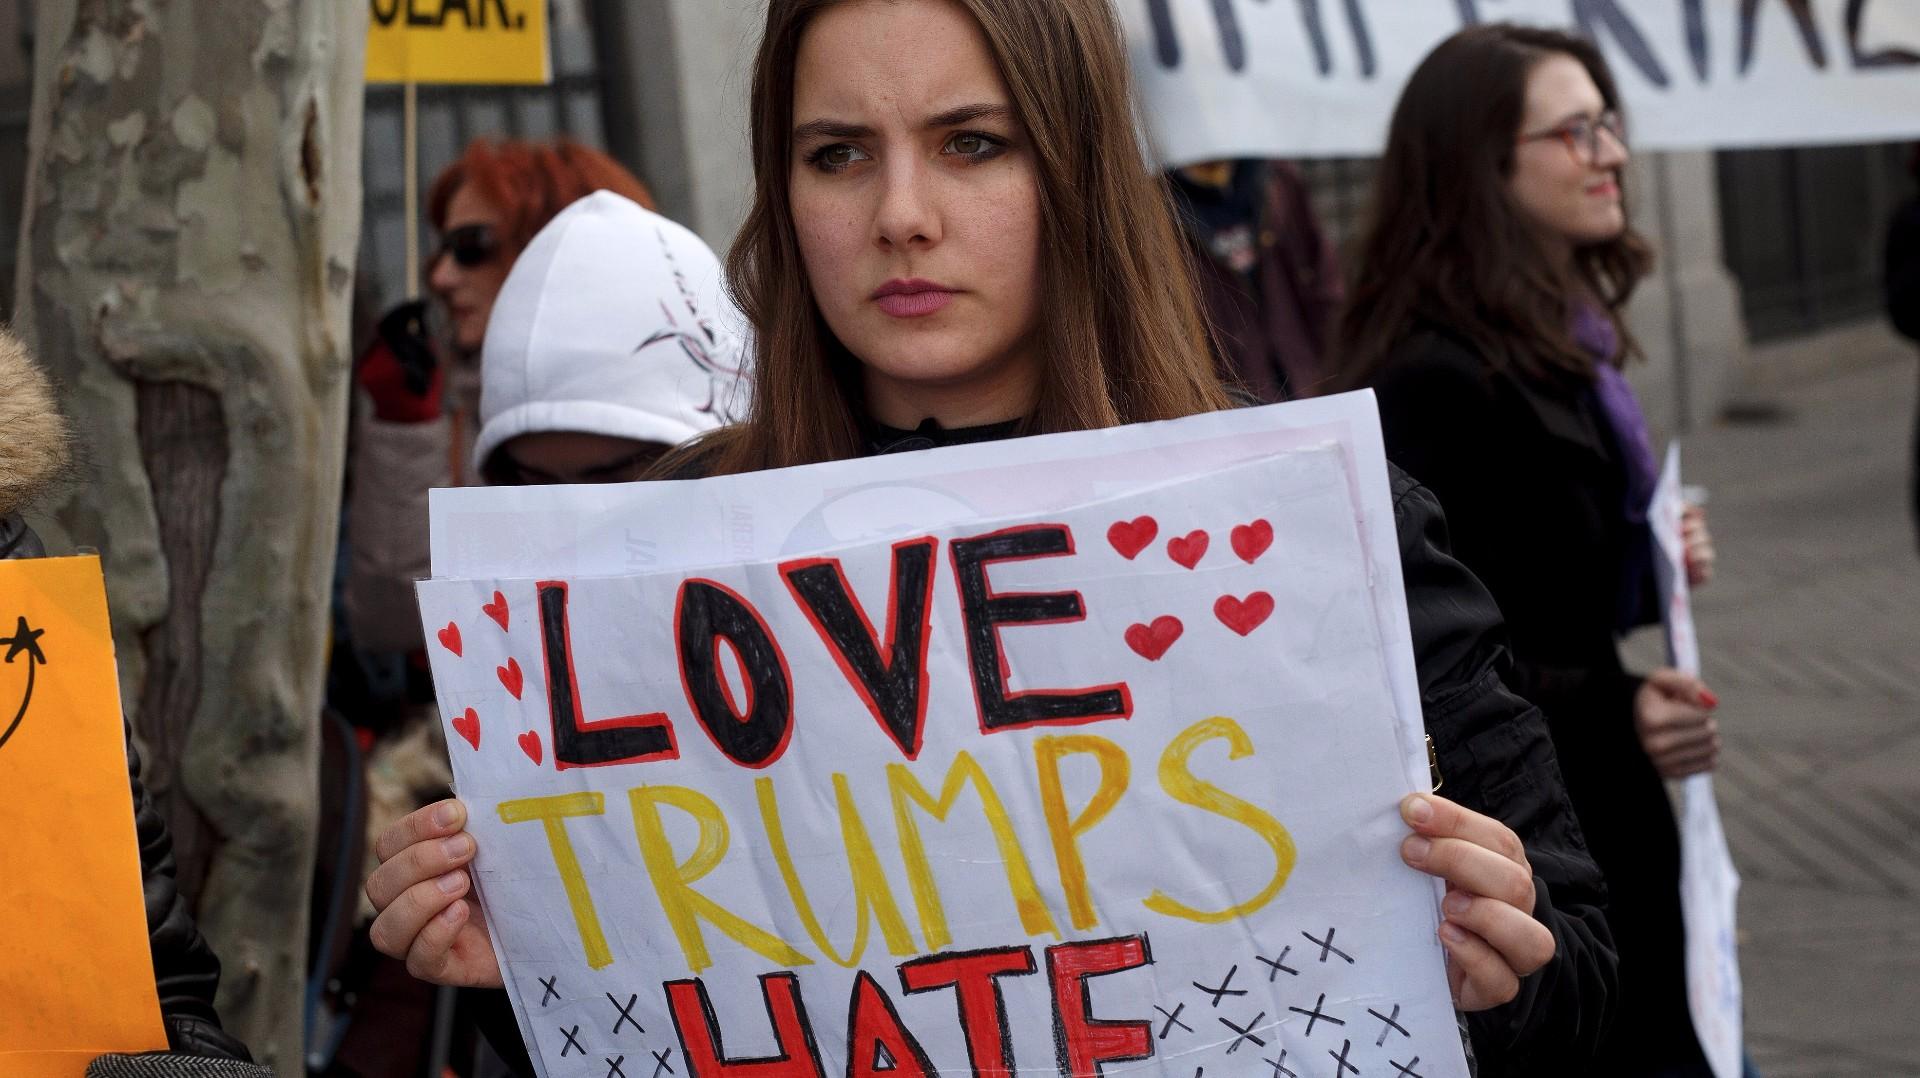 PHOTOS: Women's marches around the world